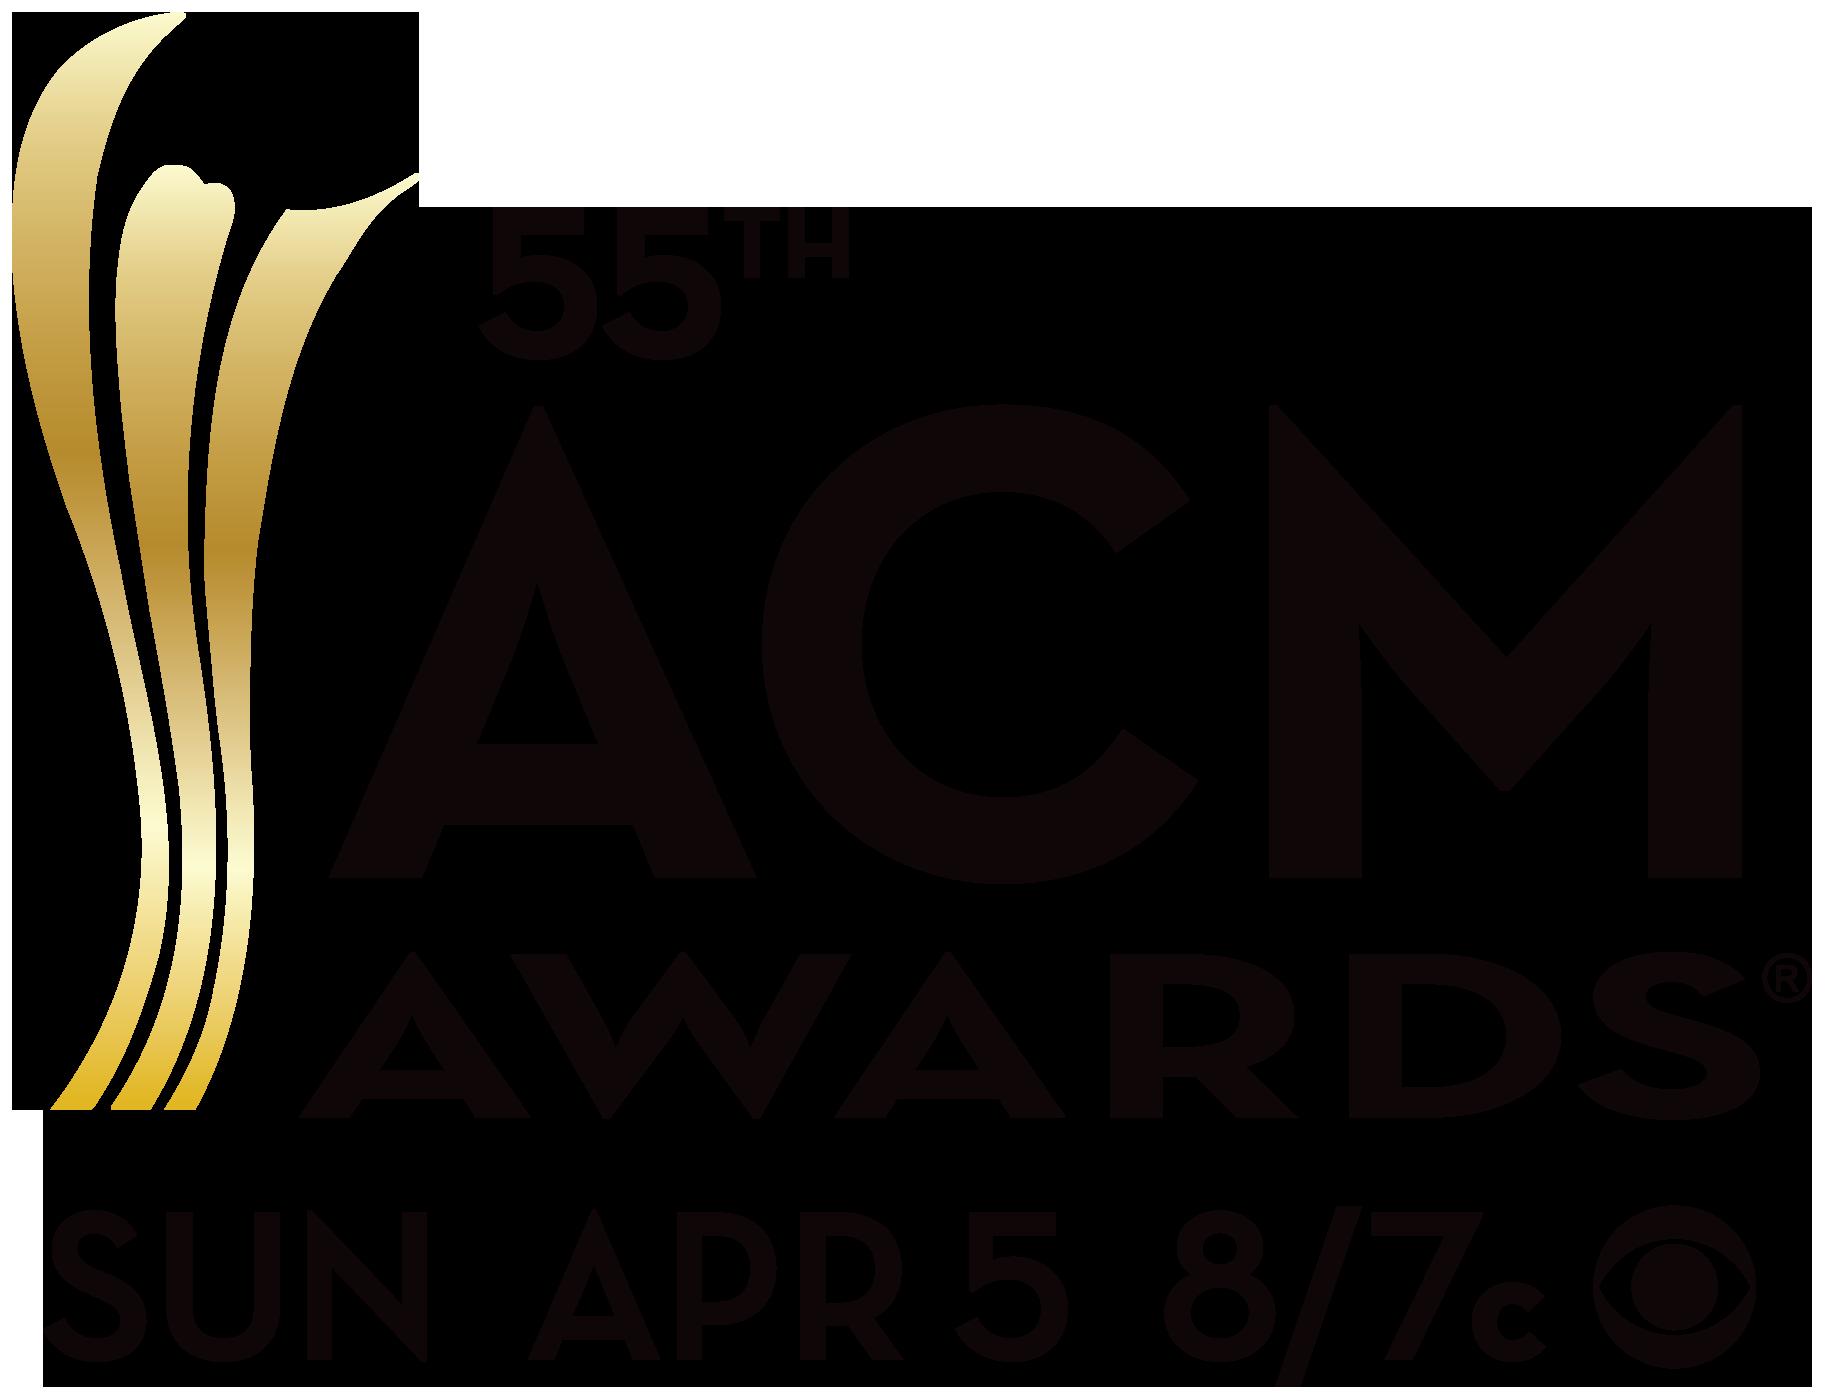 ACM Awards: Maren Morris, Thomas Rhett Lead The Nominees and Keith Urban Will Host!